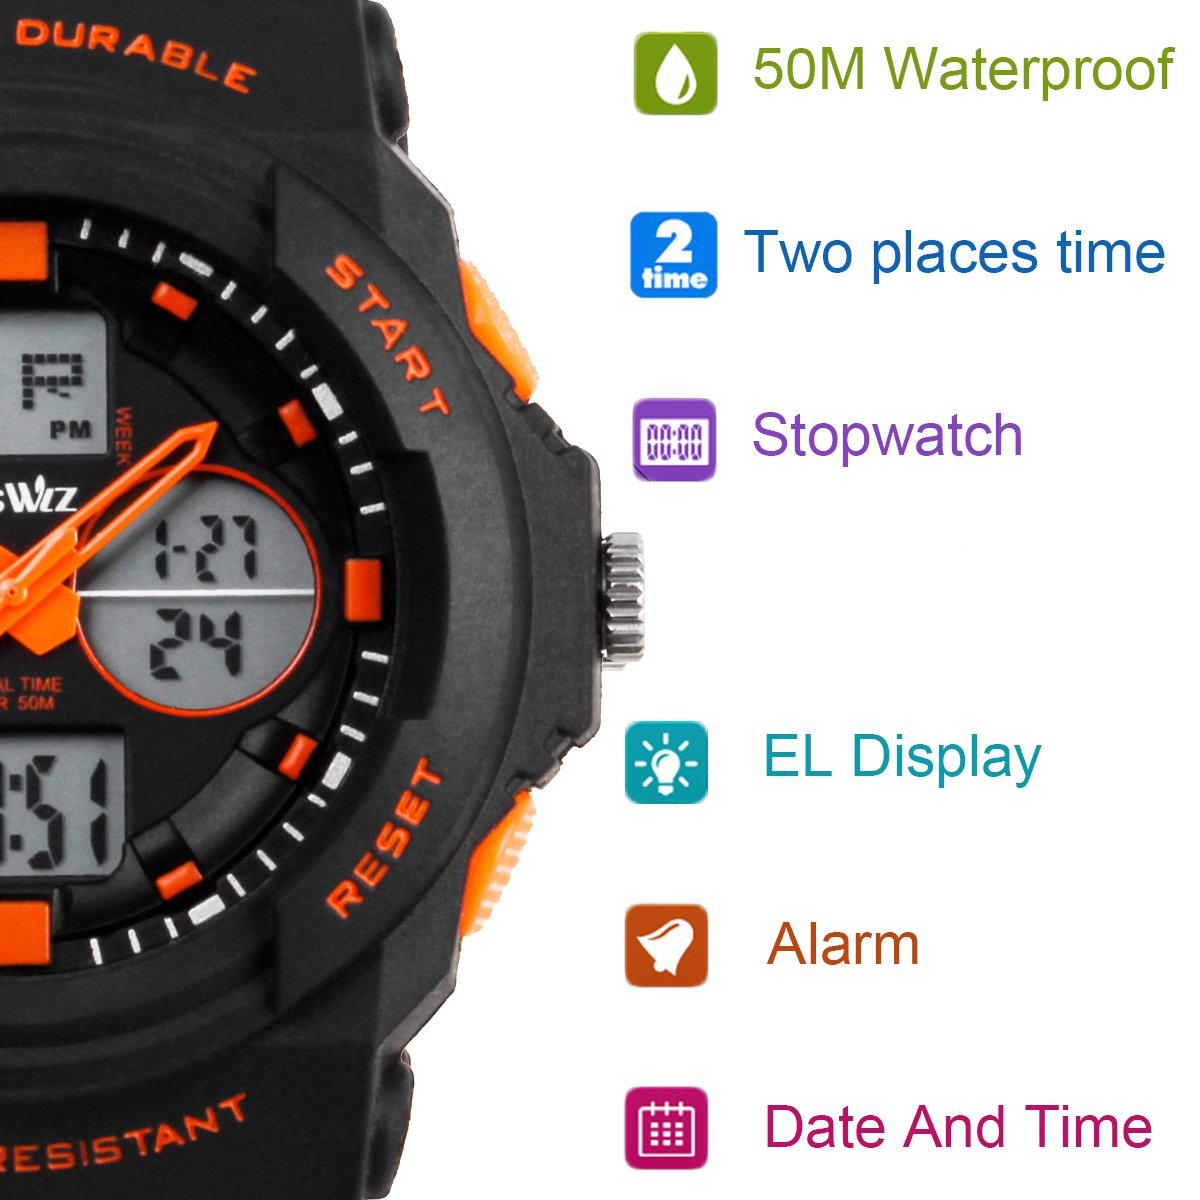 BesWLZ Multi Function Digital LED Quartz Watch Water Resistant Electronic Sport Watches Child Orange by BesWlz (Image #2)